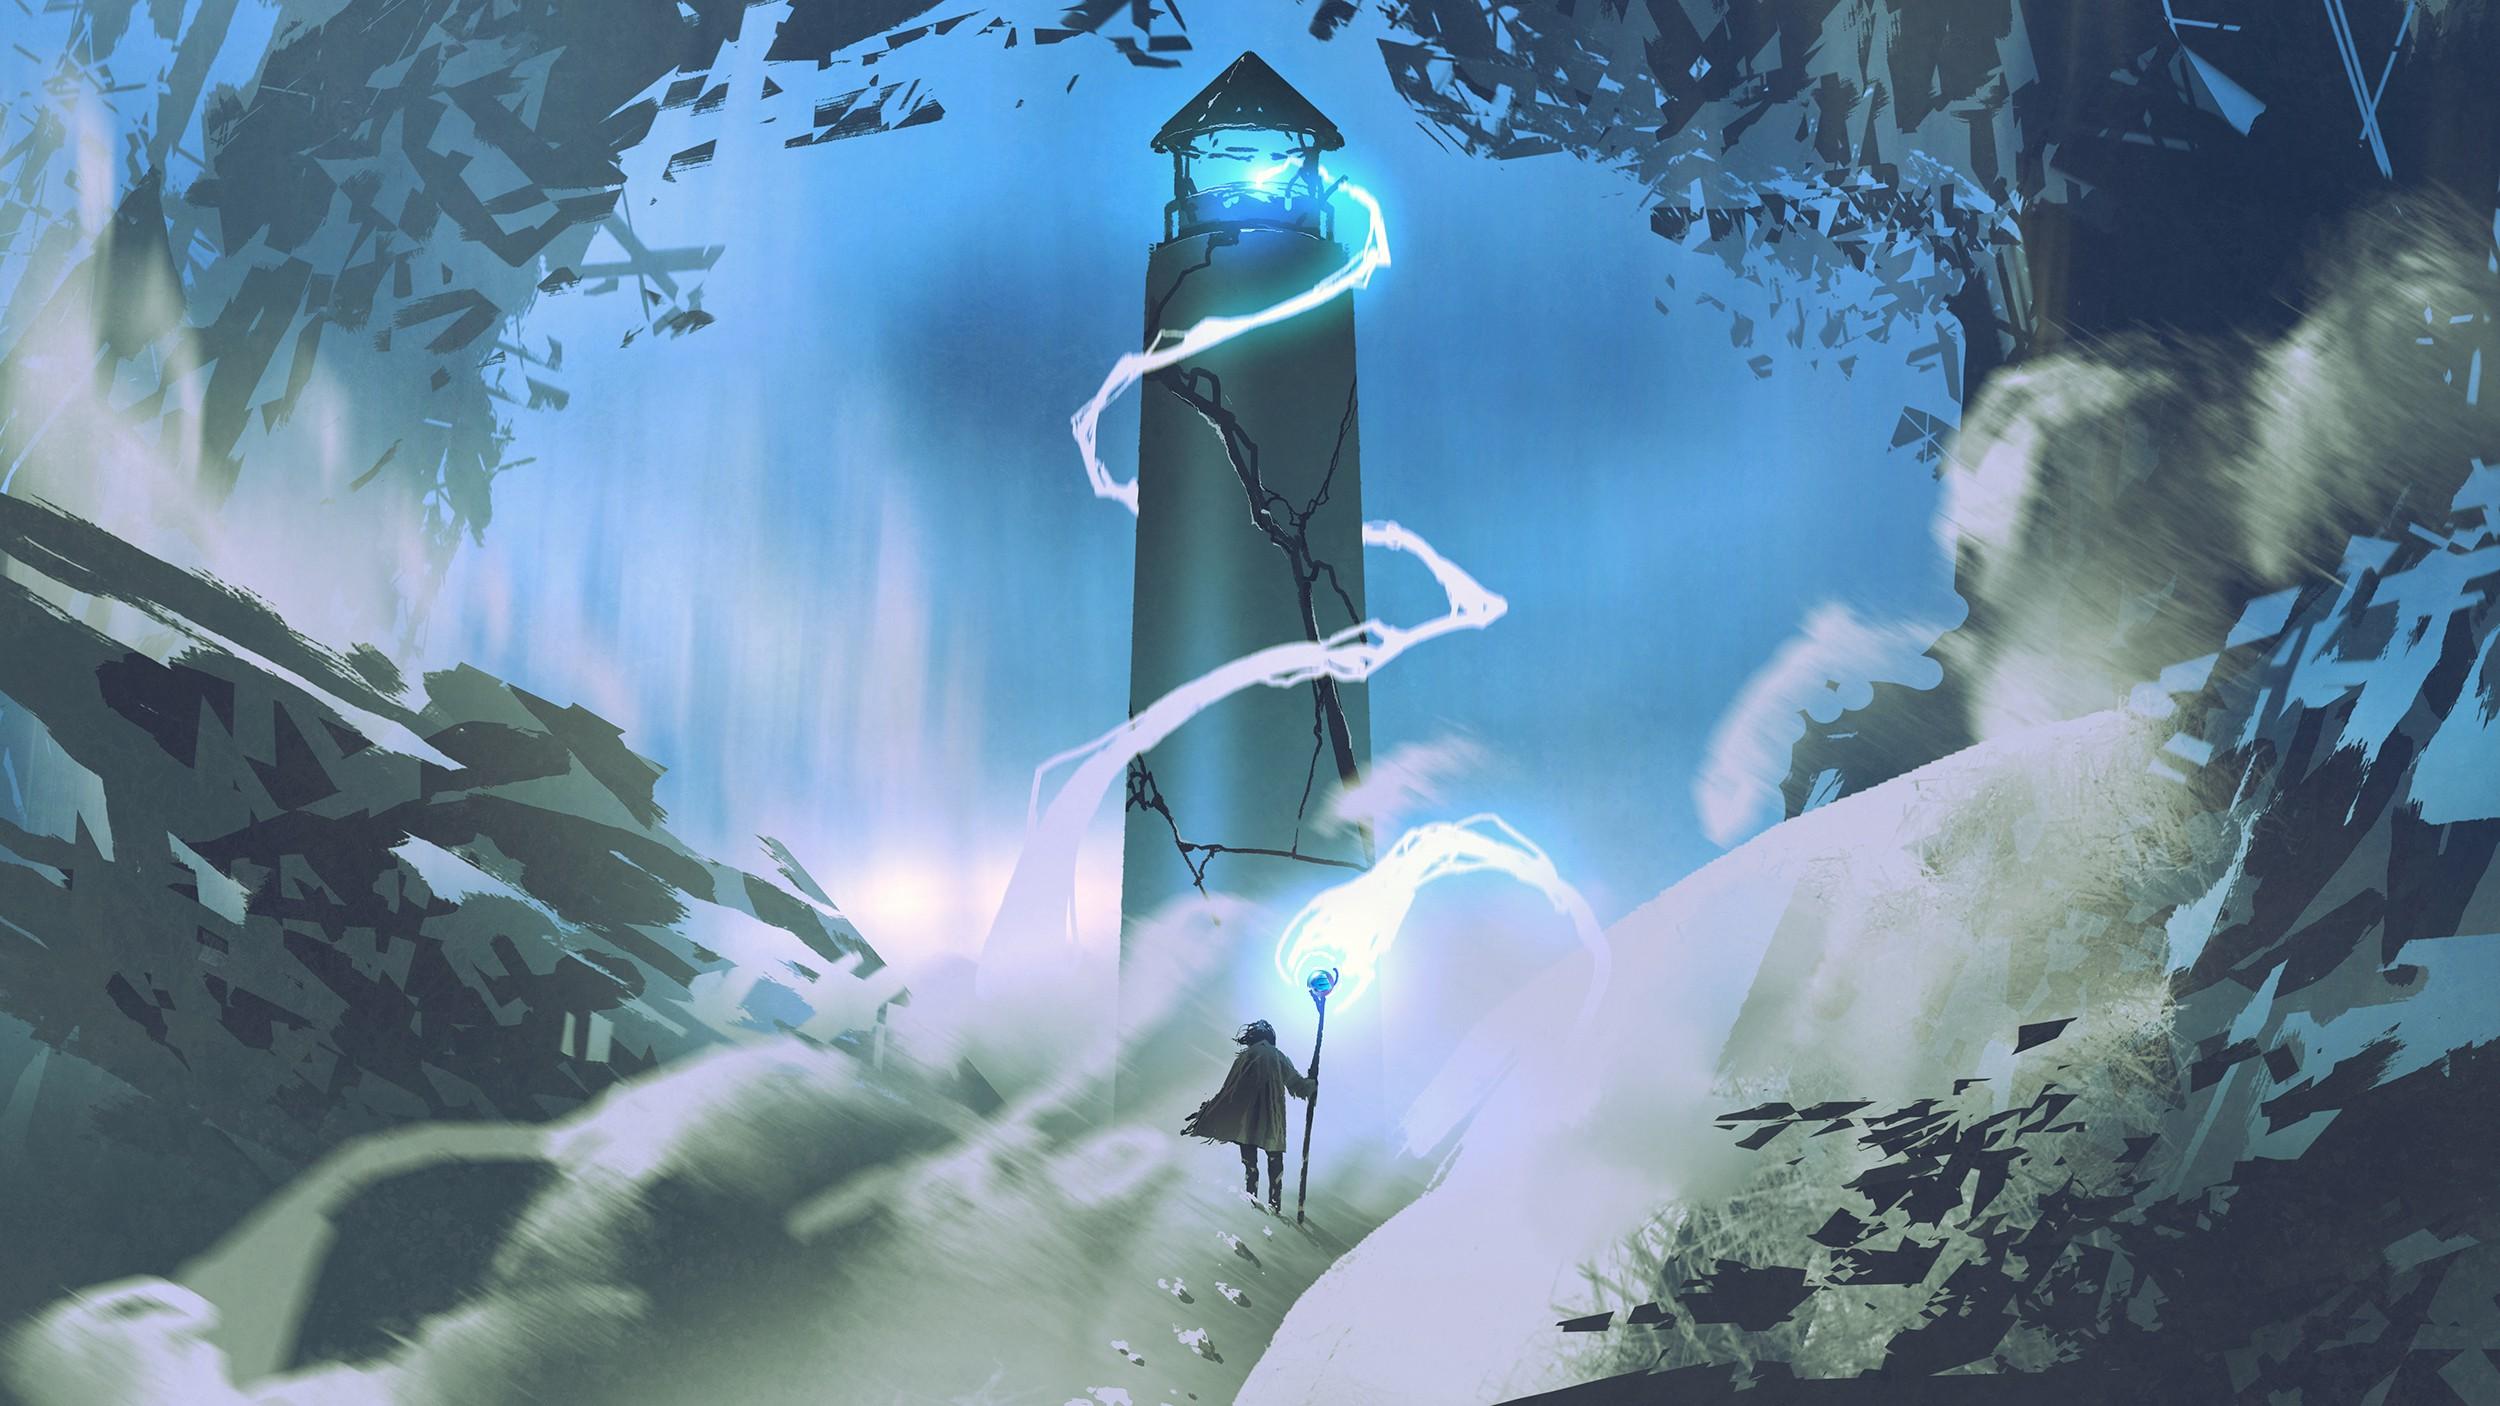 artwork from  https://blog.enjincoin.io